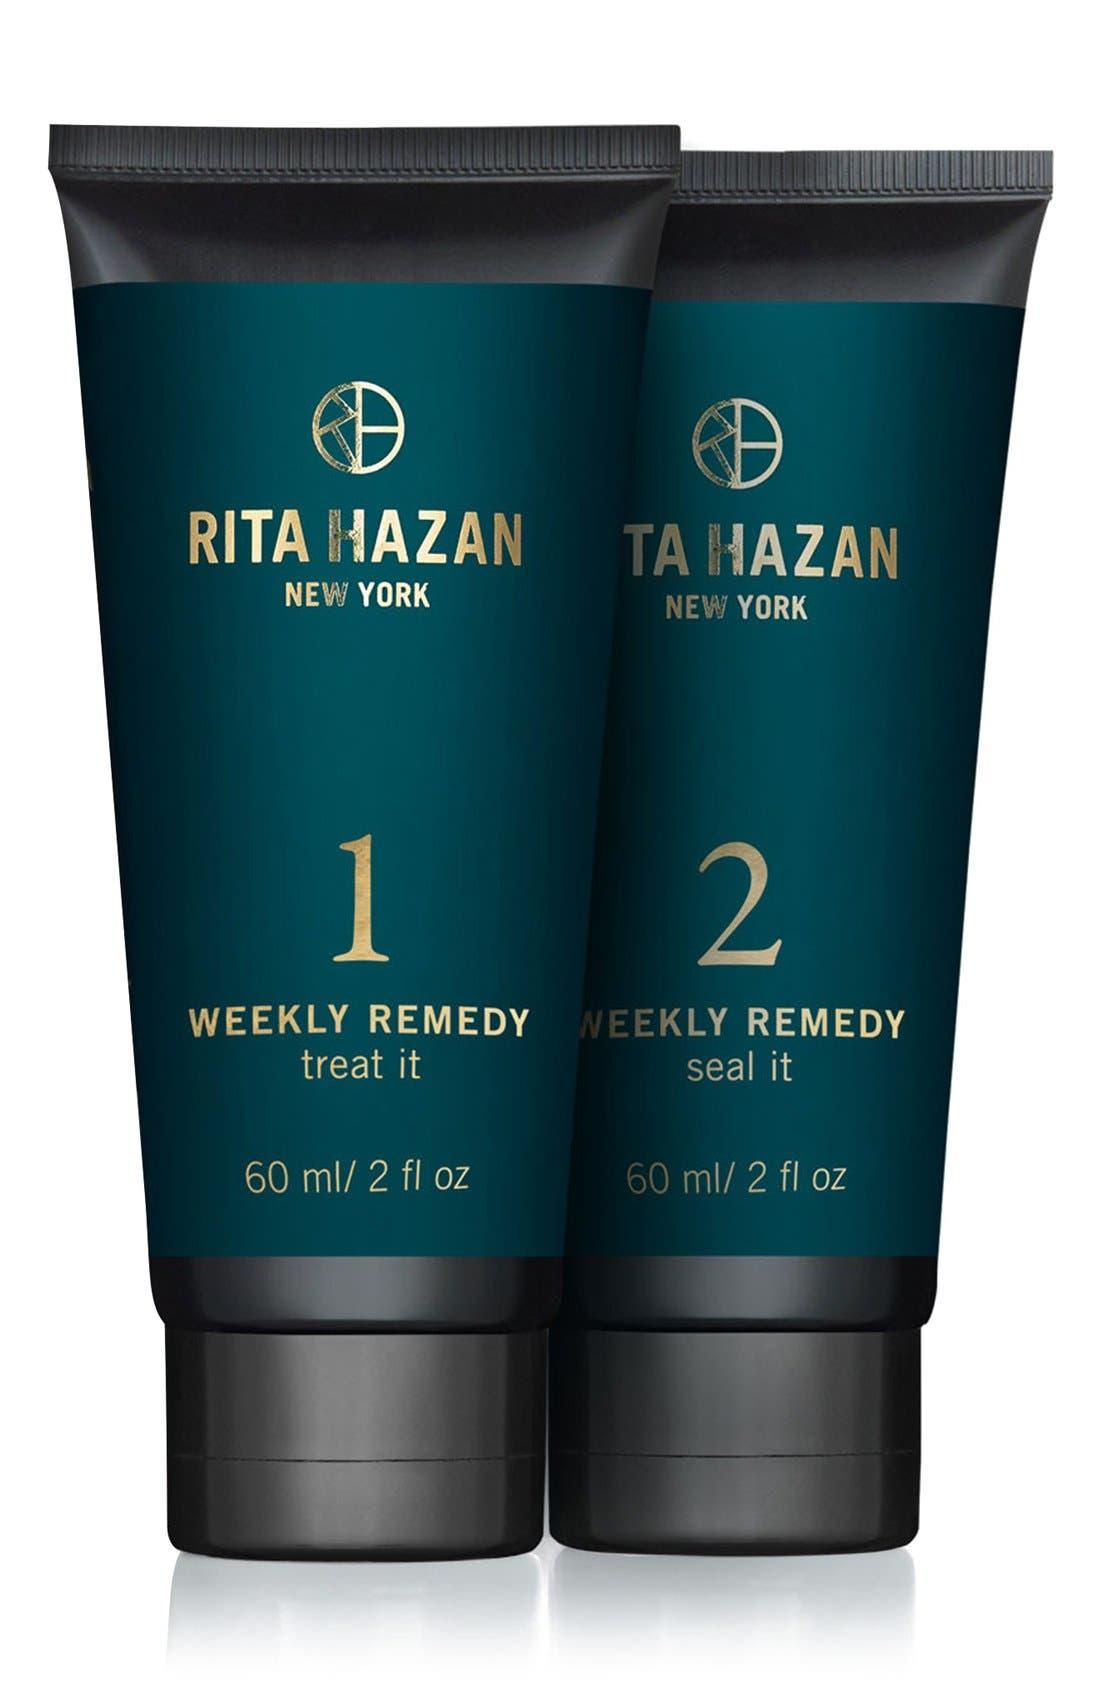 RITA HAZAN NEW YORK Weekly Remedy Treatment